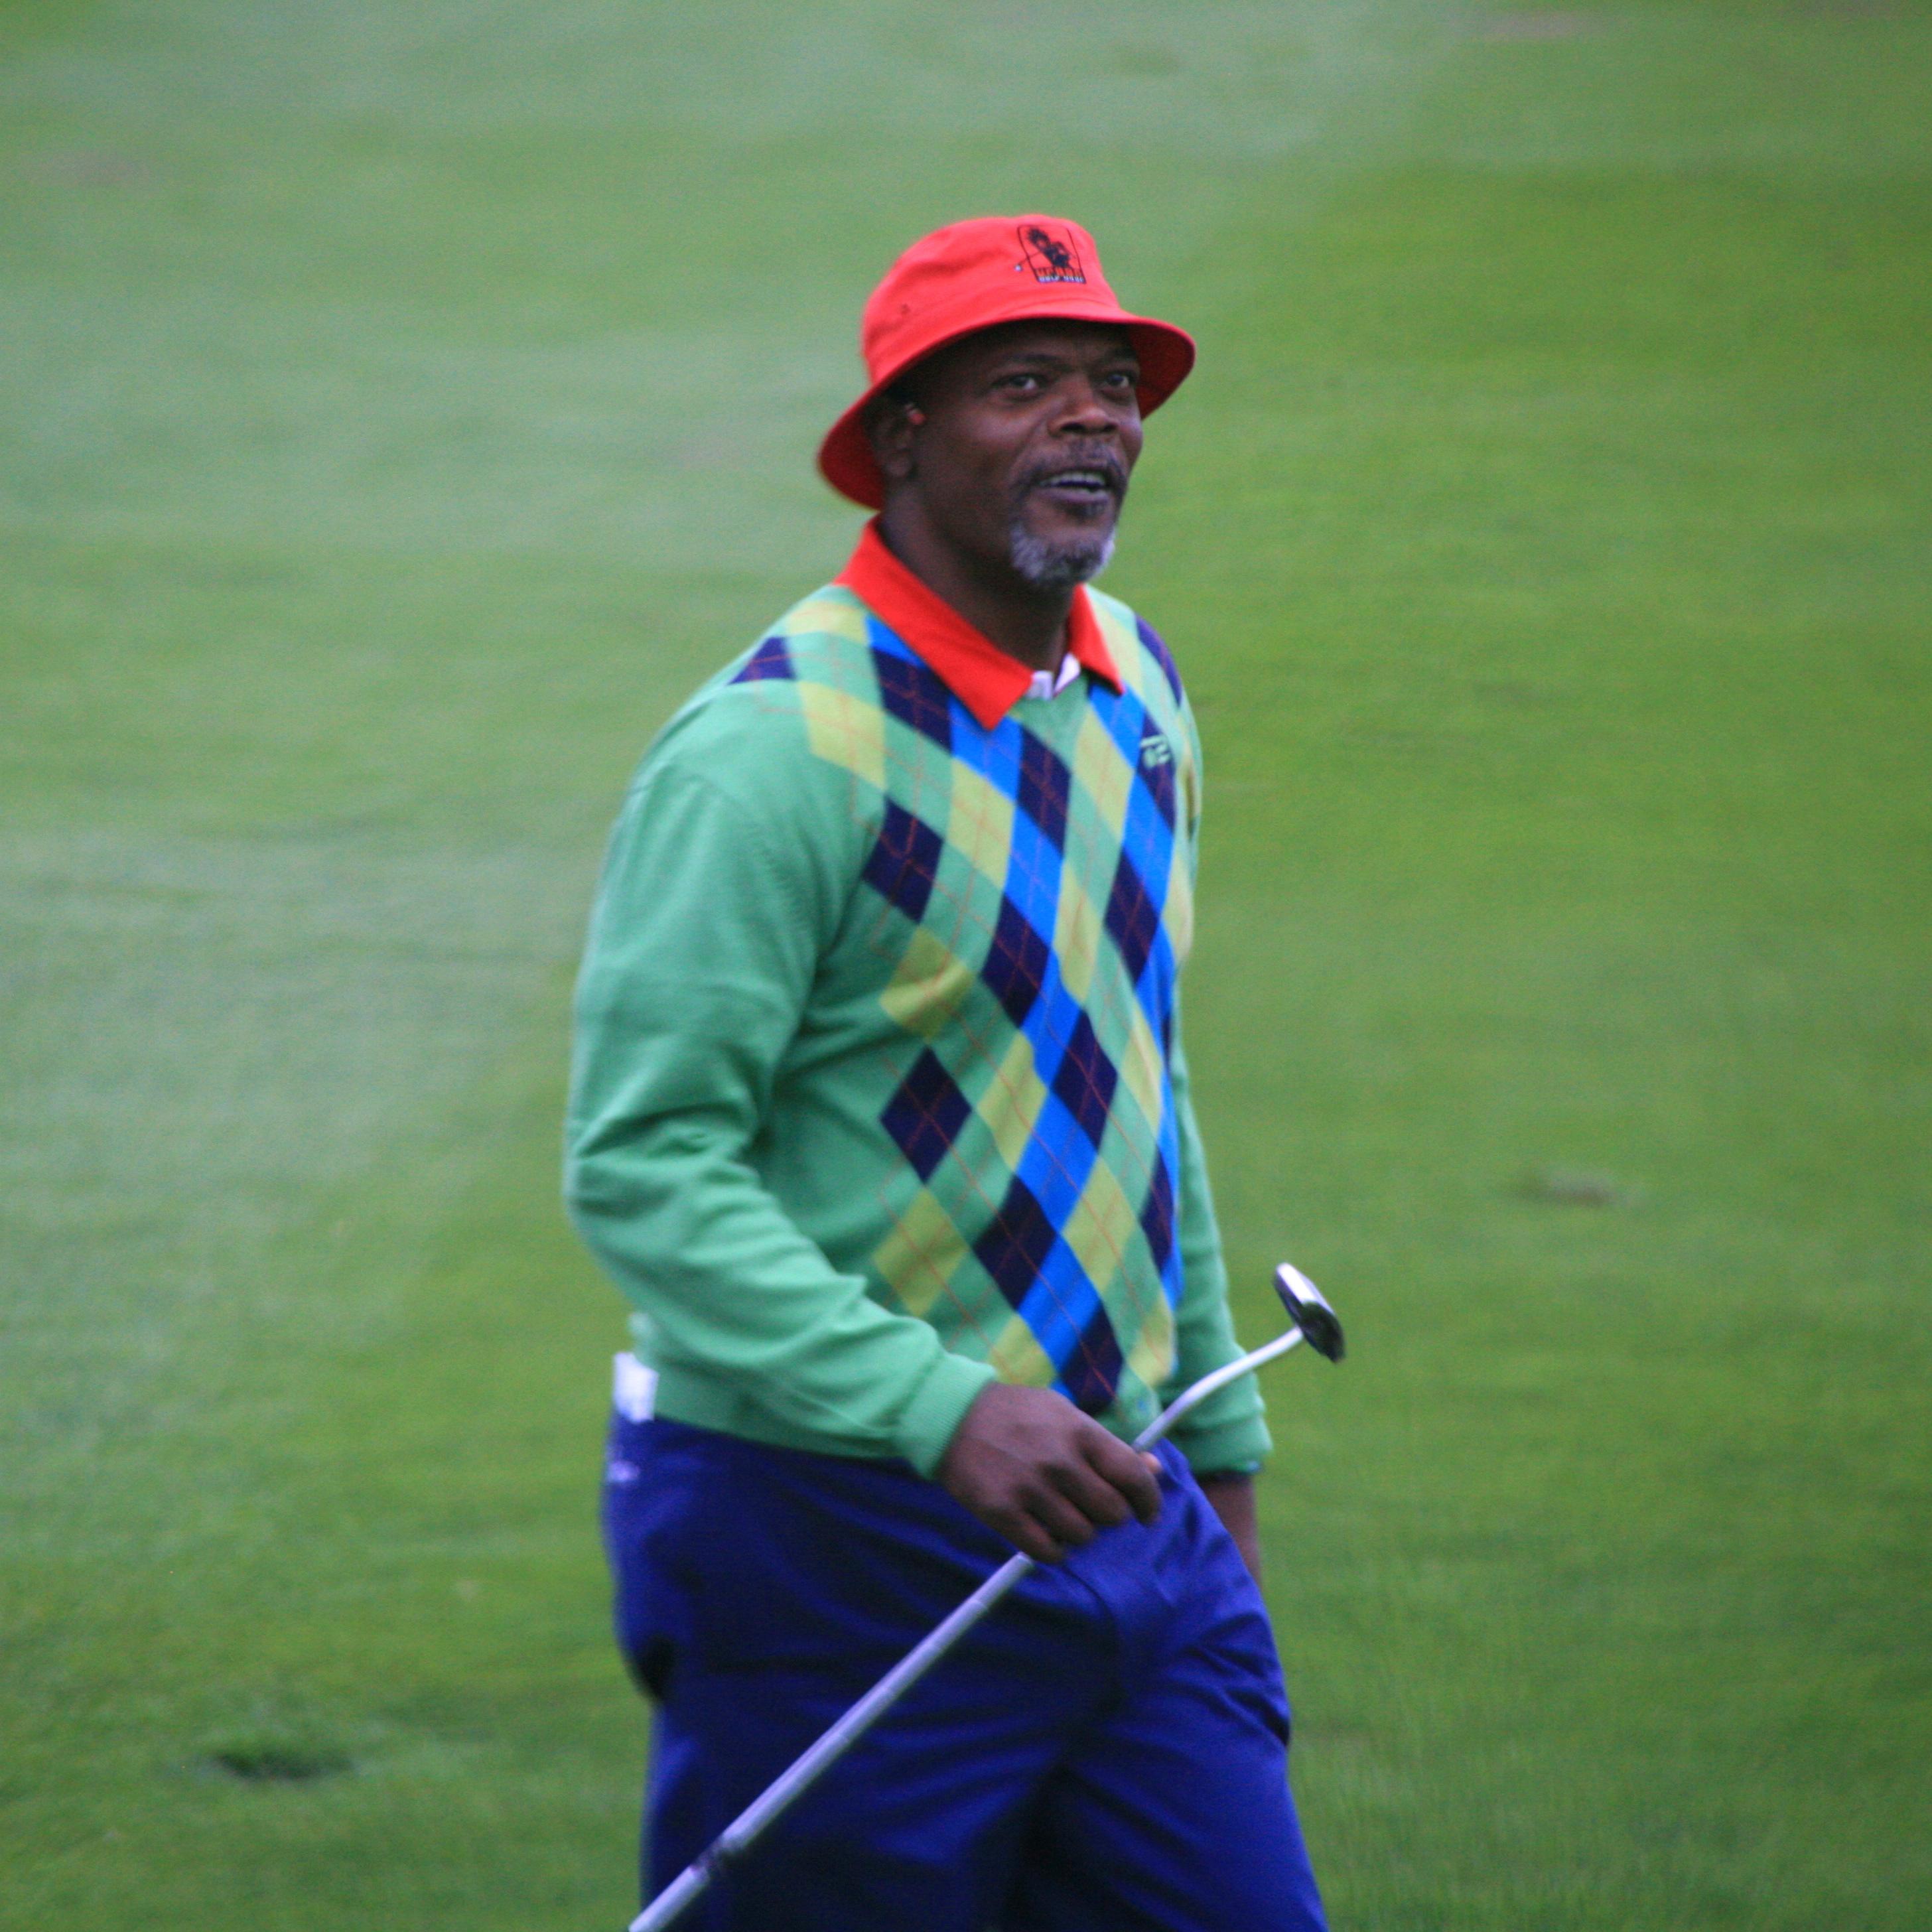 File:Samuel L Jackson golfing.jpg - Wikimedia Commons